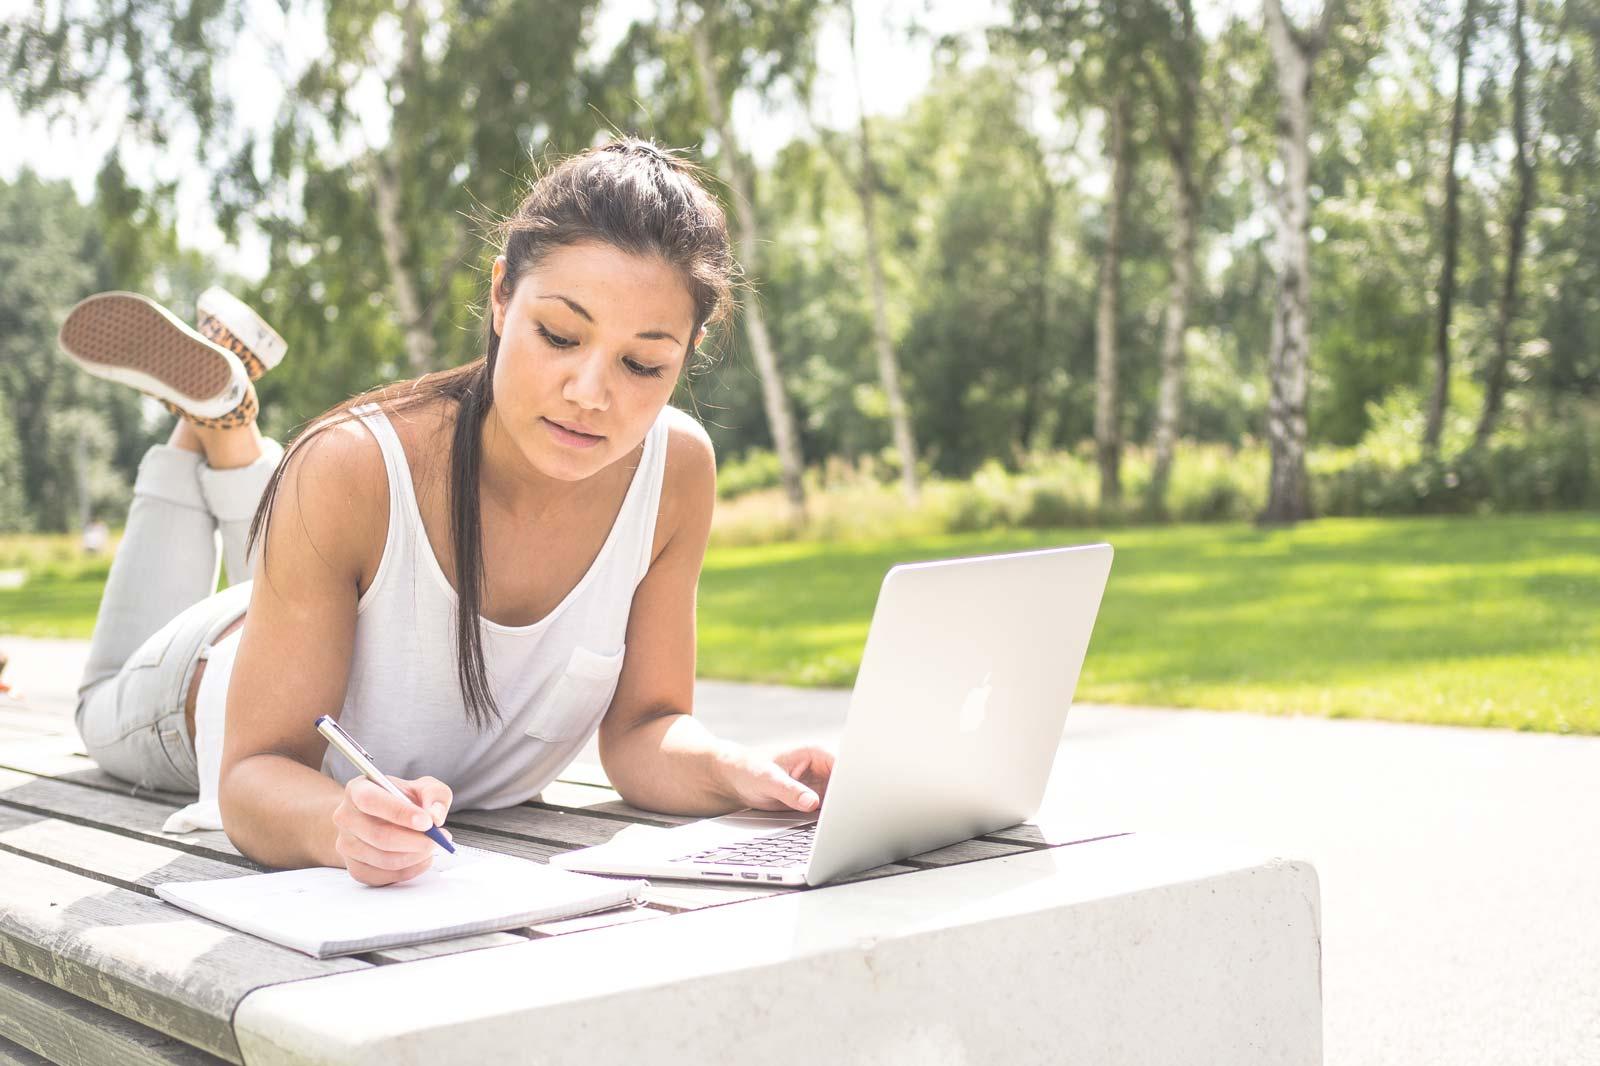 Comspot: 15 Prozent Rabatt auf Apple-Geräte (Studenten/Lehre/Schüler)